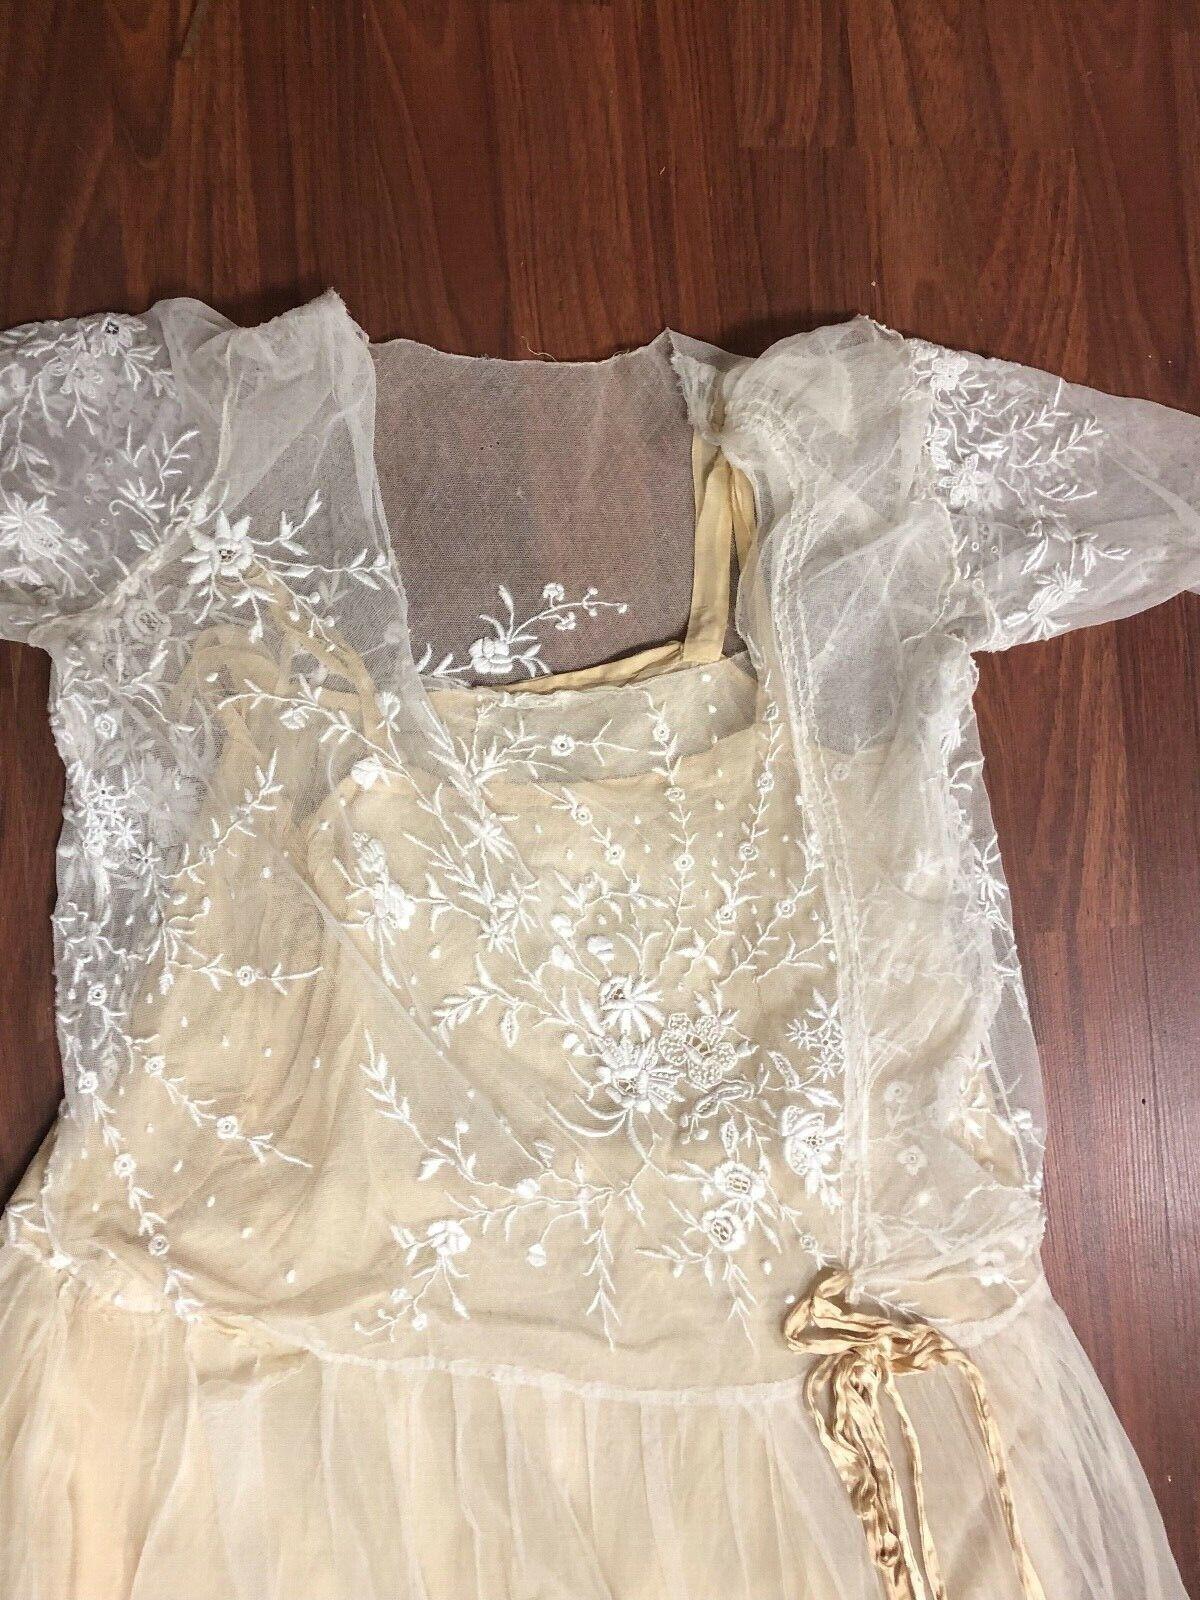 Antique Edwardian White Mesh Dress with Floral Em… - image 4